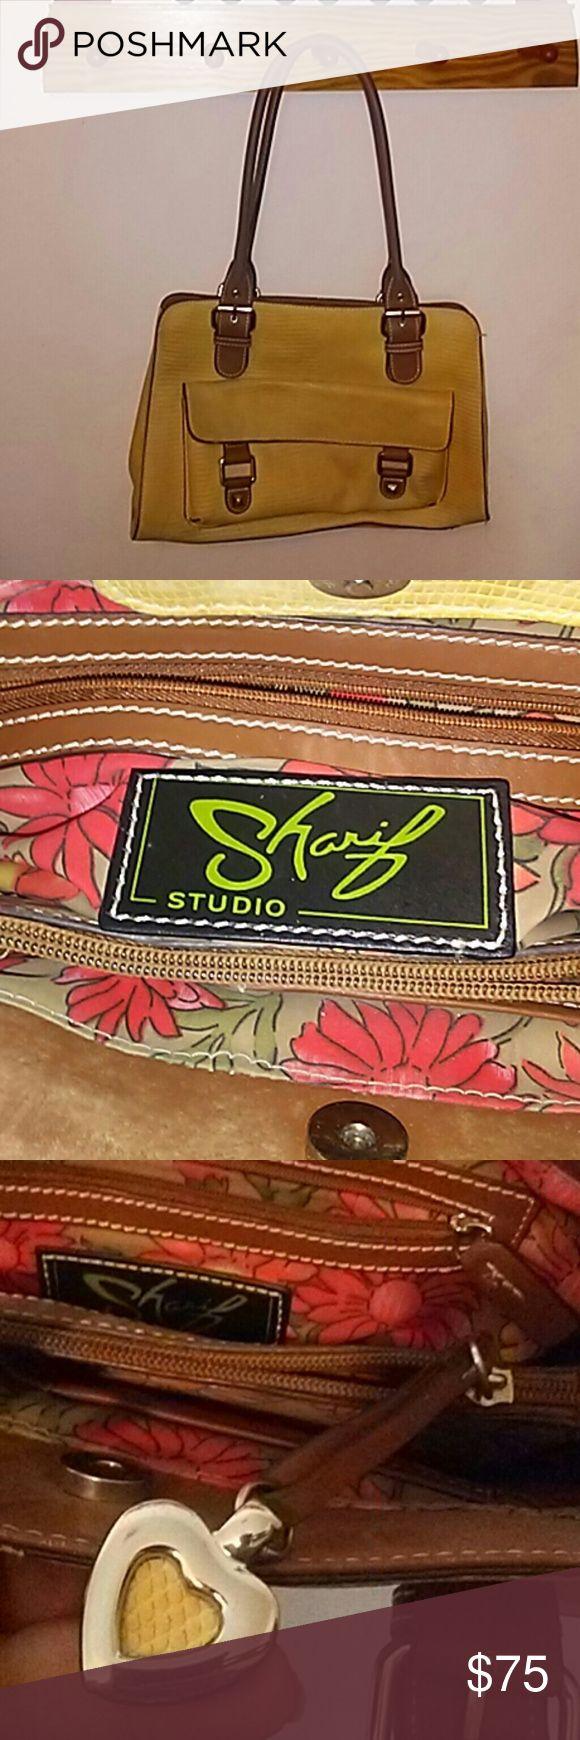 Sharif Studio Satchel Has a nice opulent look. Fair condition. Sharif Bags Satchels